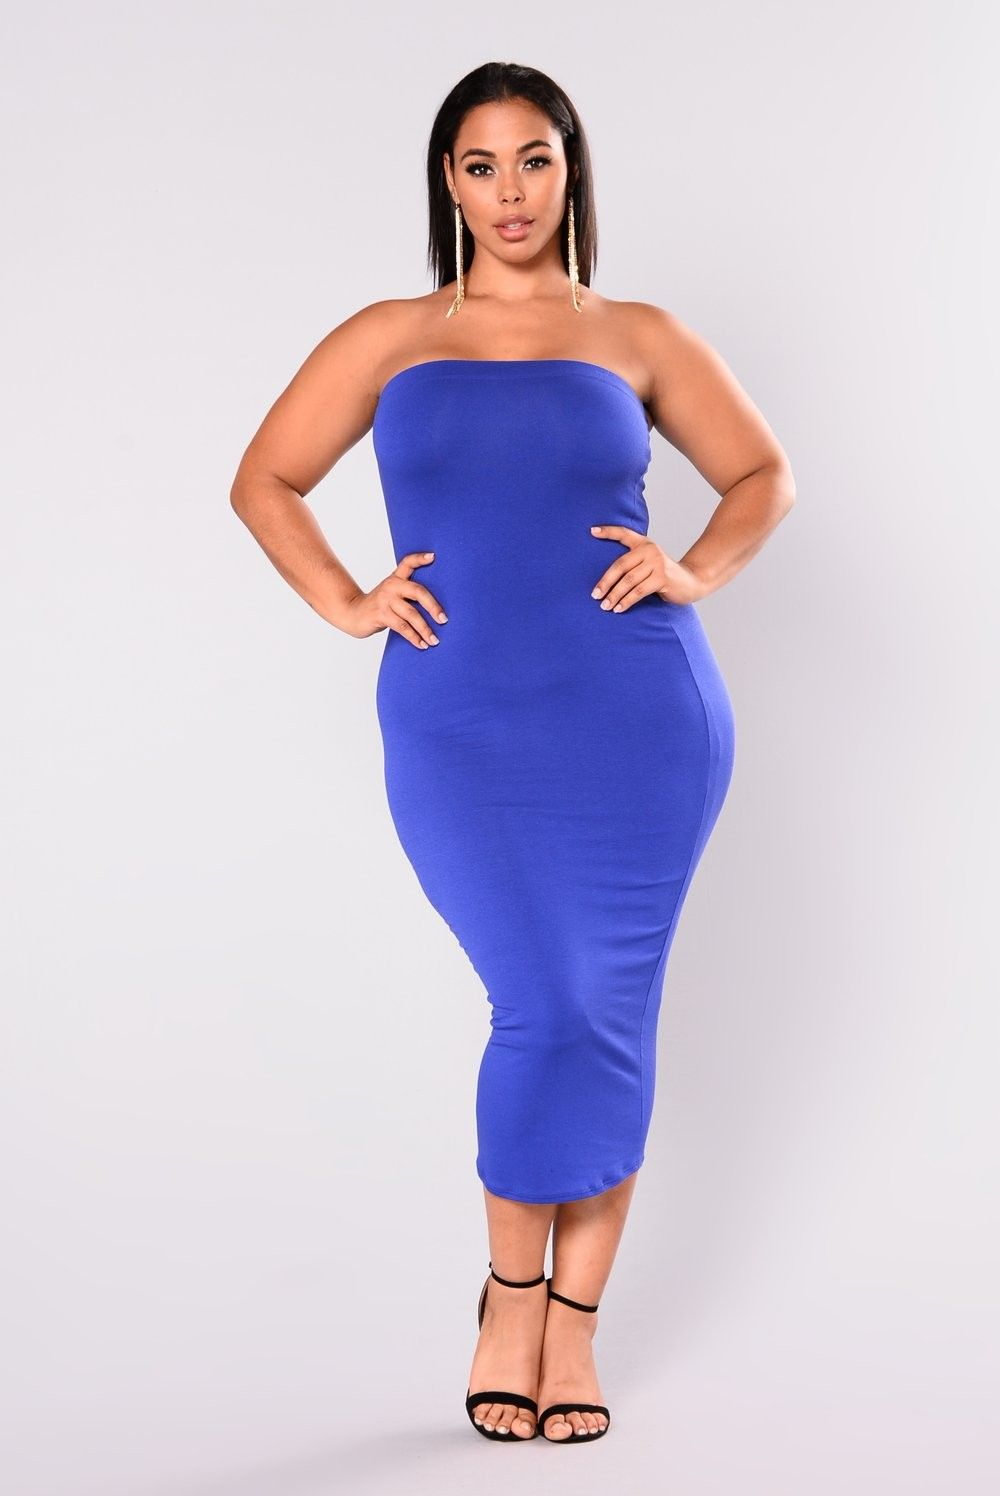 3e98181e469 Plus Size Eva Dress - Royal  24.99  fashion  ootd  outfit  oufits  moda   plussize  dress  dresses  plussizeclothing  plussizedress  curve  curvy   sexy ...